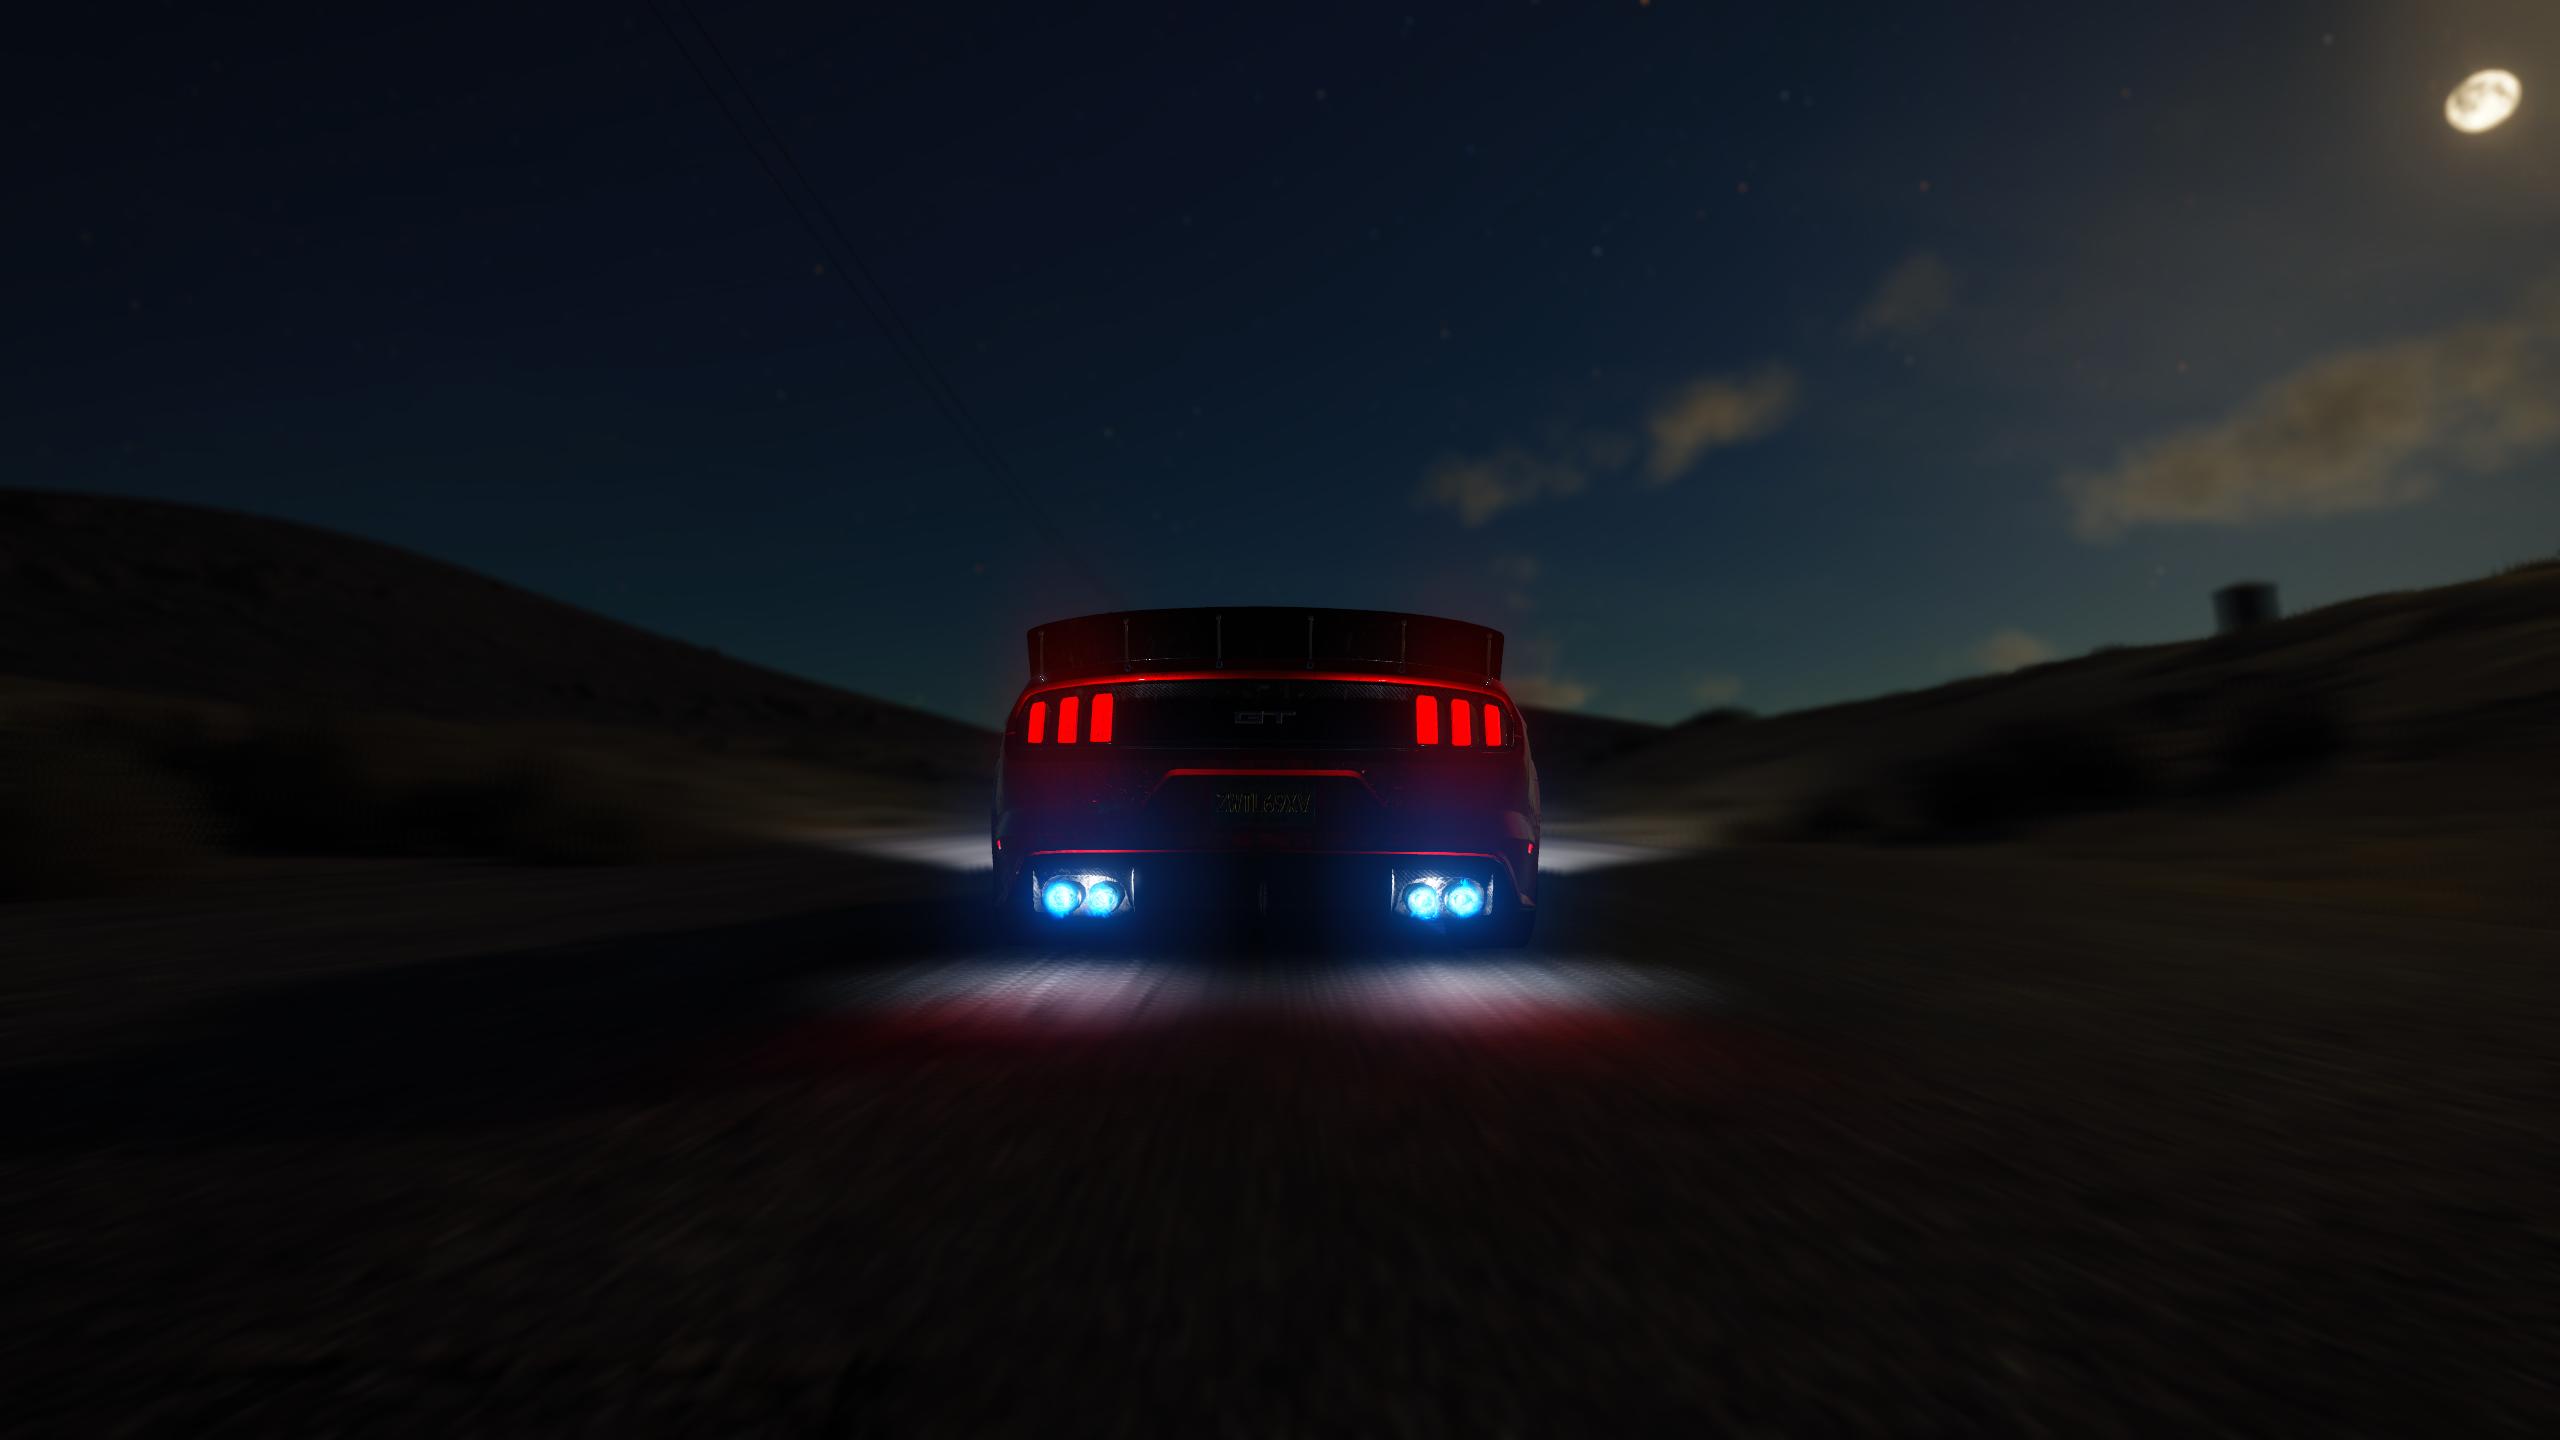 sunset night car reflection evening The Crew Ford Mustang GT nitro dusk driving light lighting darkness